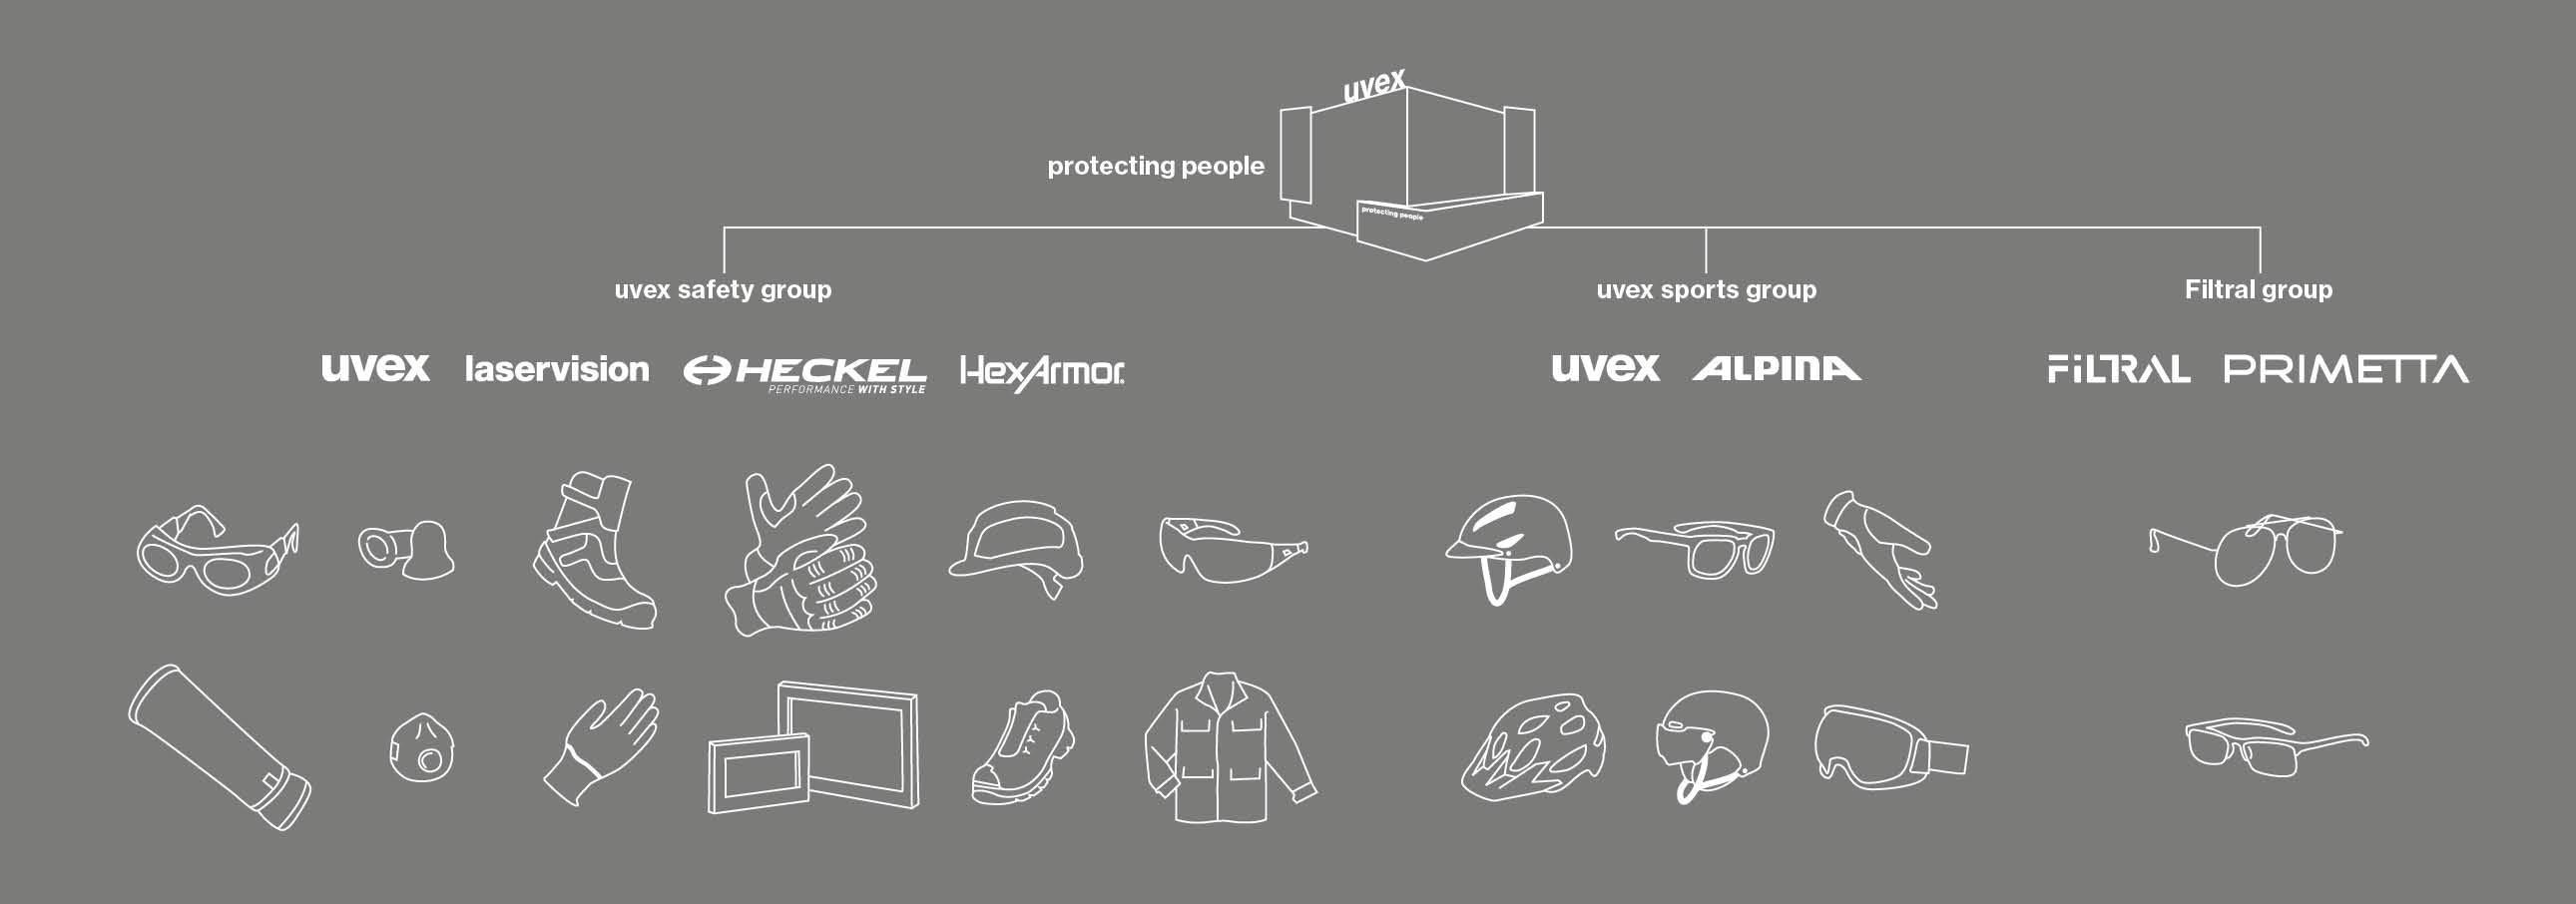 brands-uvex-group